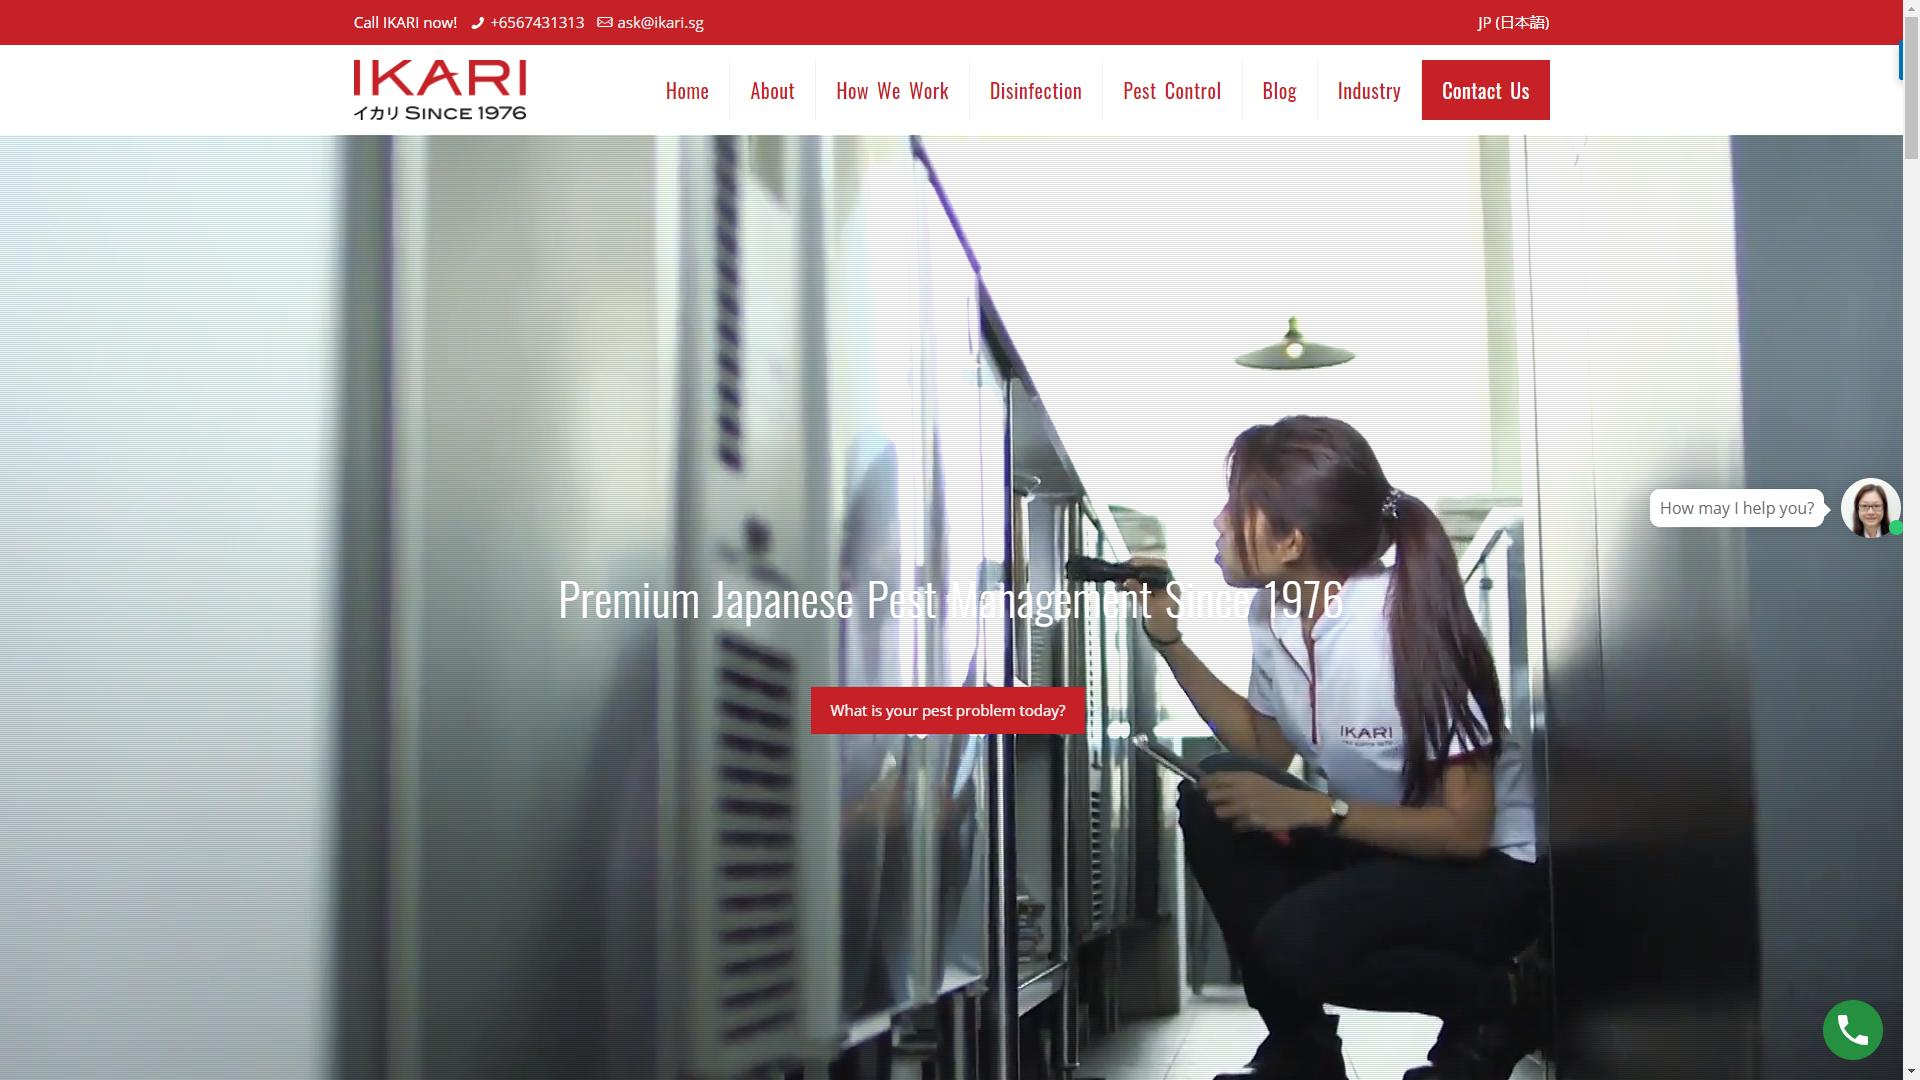 Ikari Services Pte Ltd pest control companies in Singapore